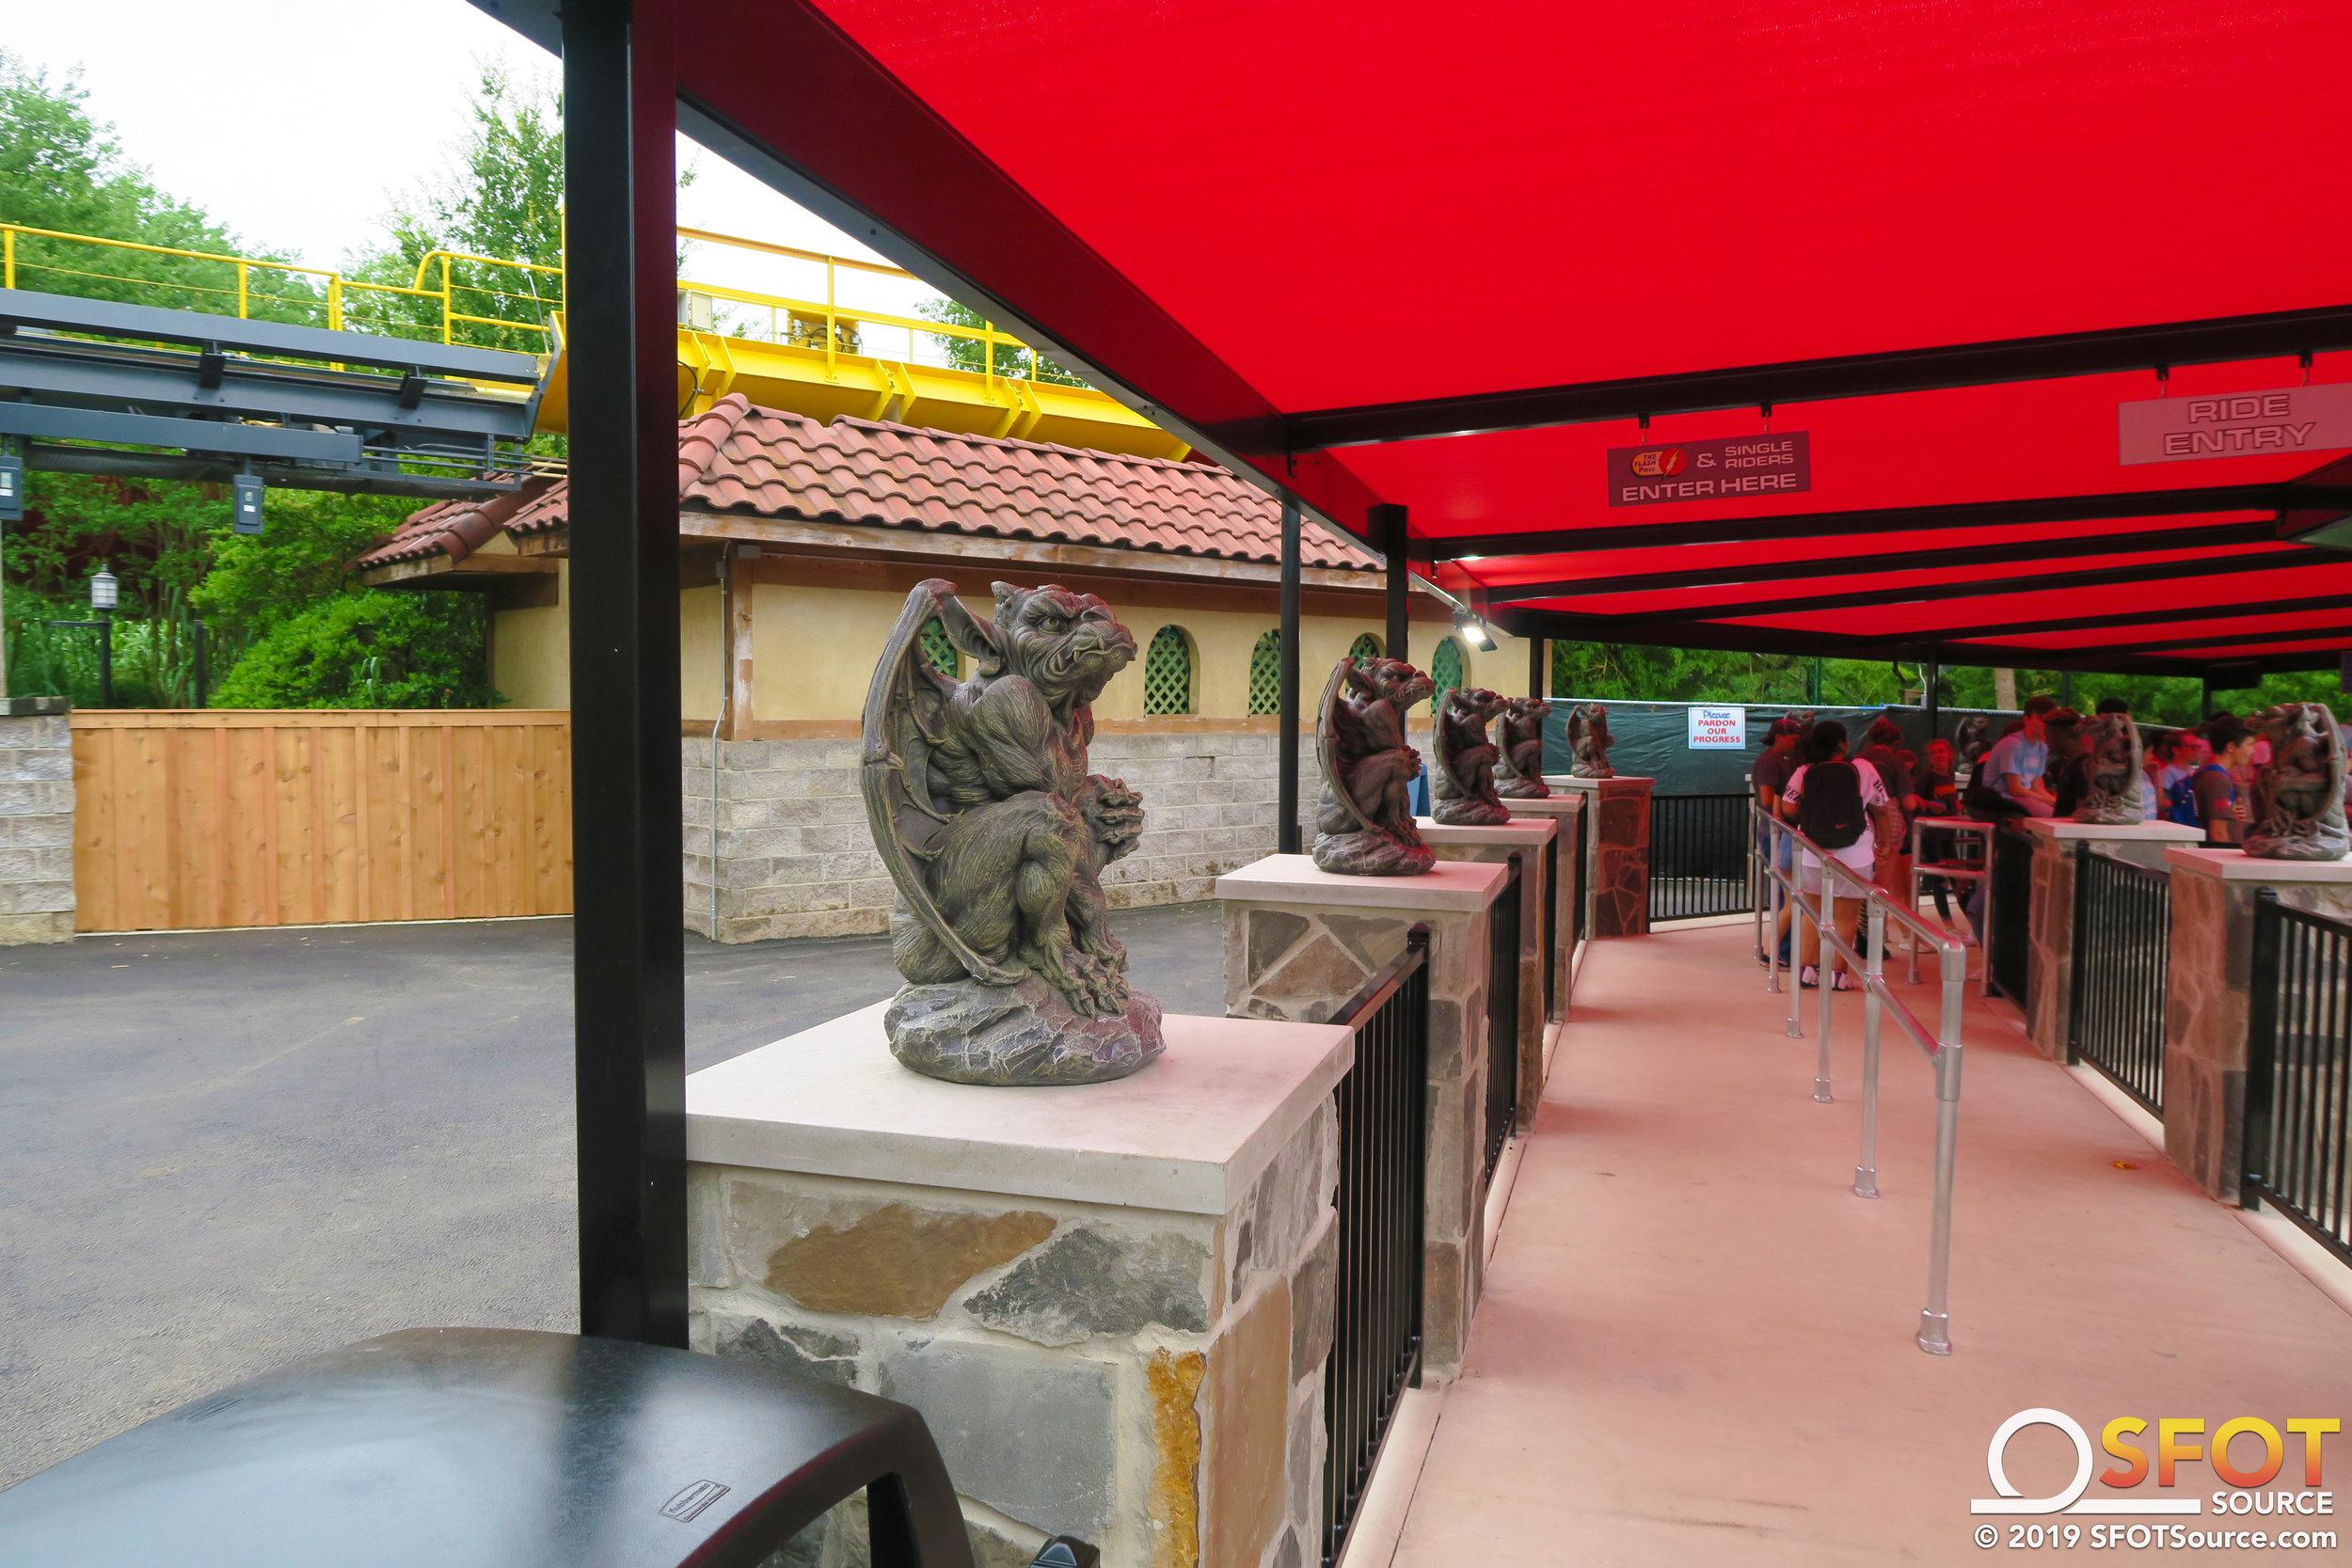 Gargoyle-like statues are found throughout El Diablo's queue line.